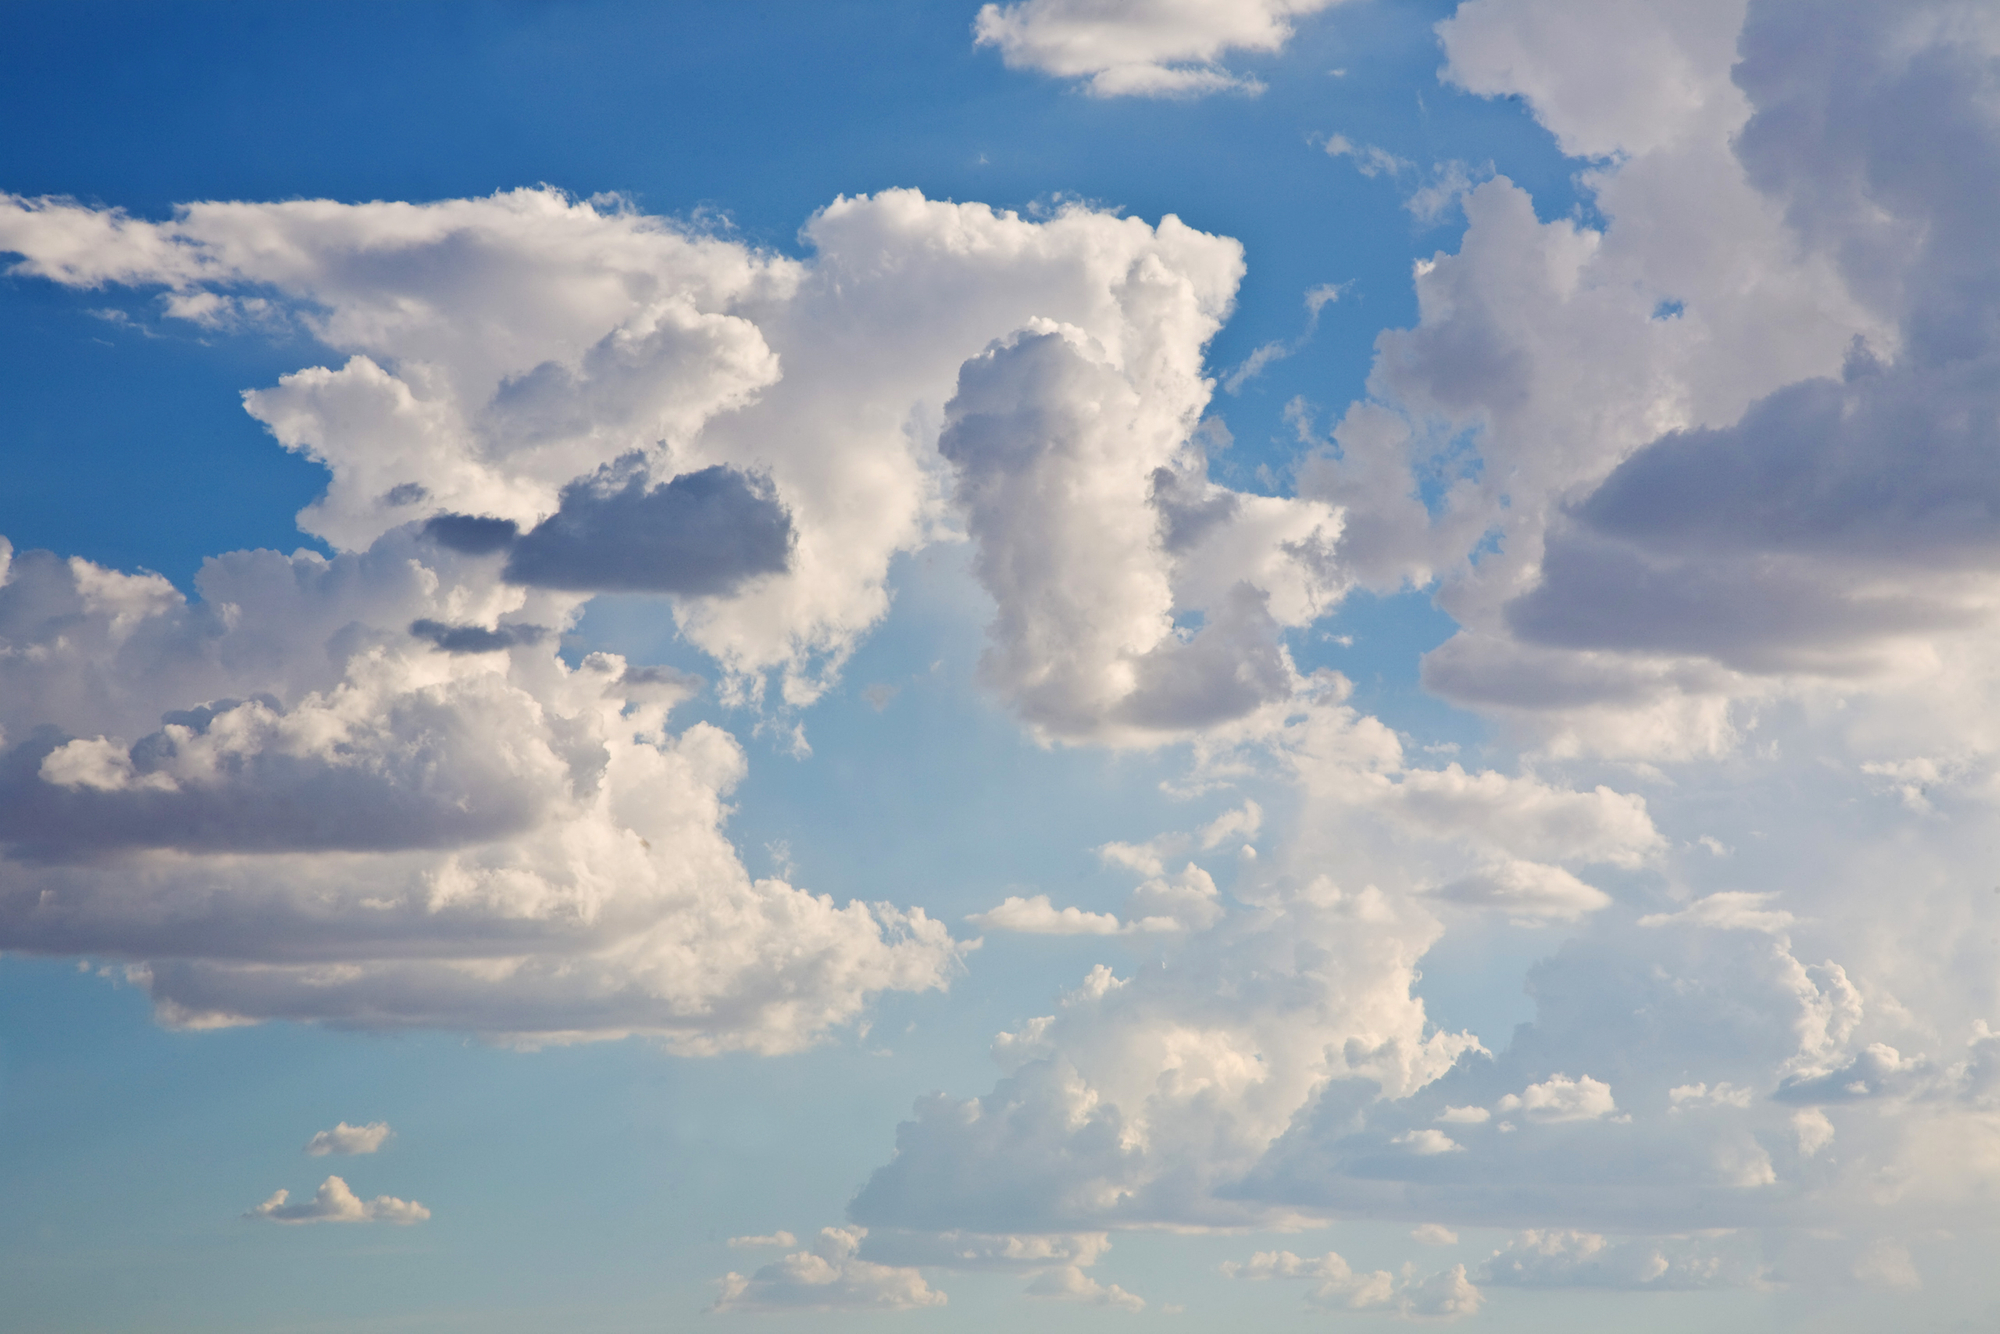 In_the_Clouds.jpg